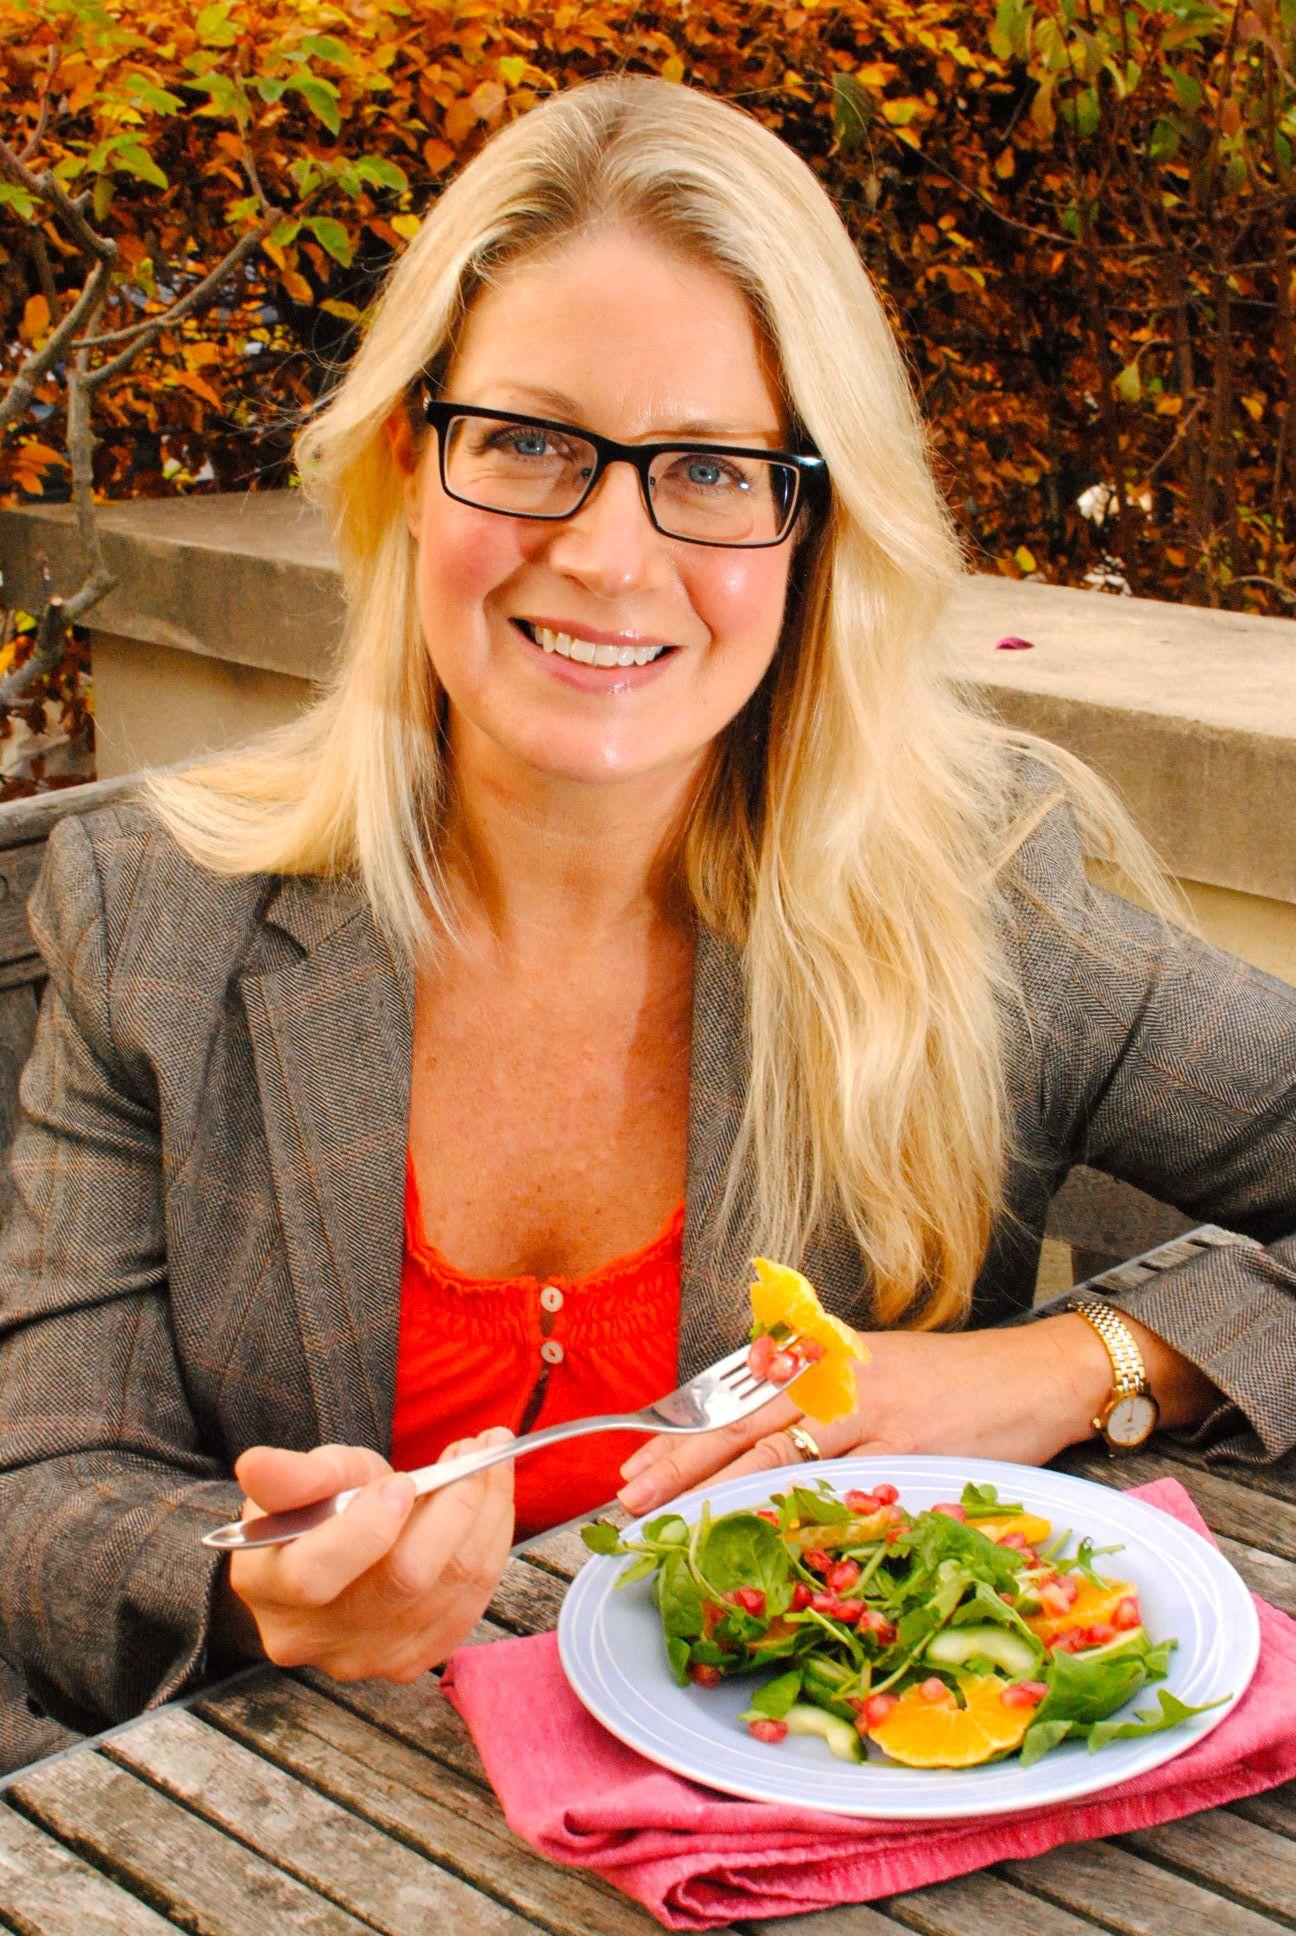 low fiber foods lists and helpful ideas My big fat